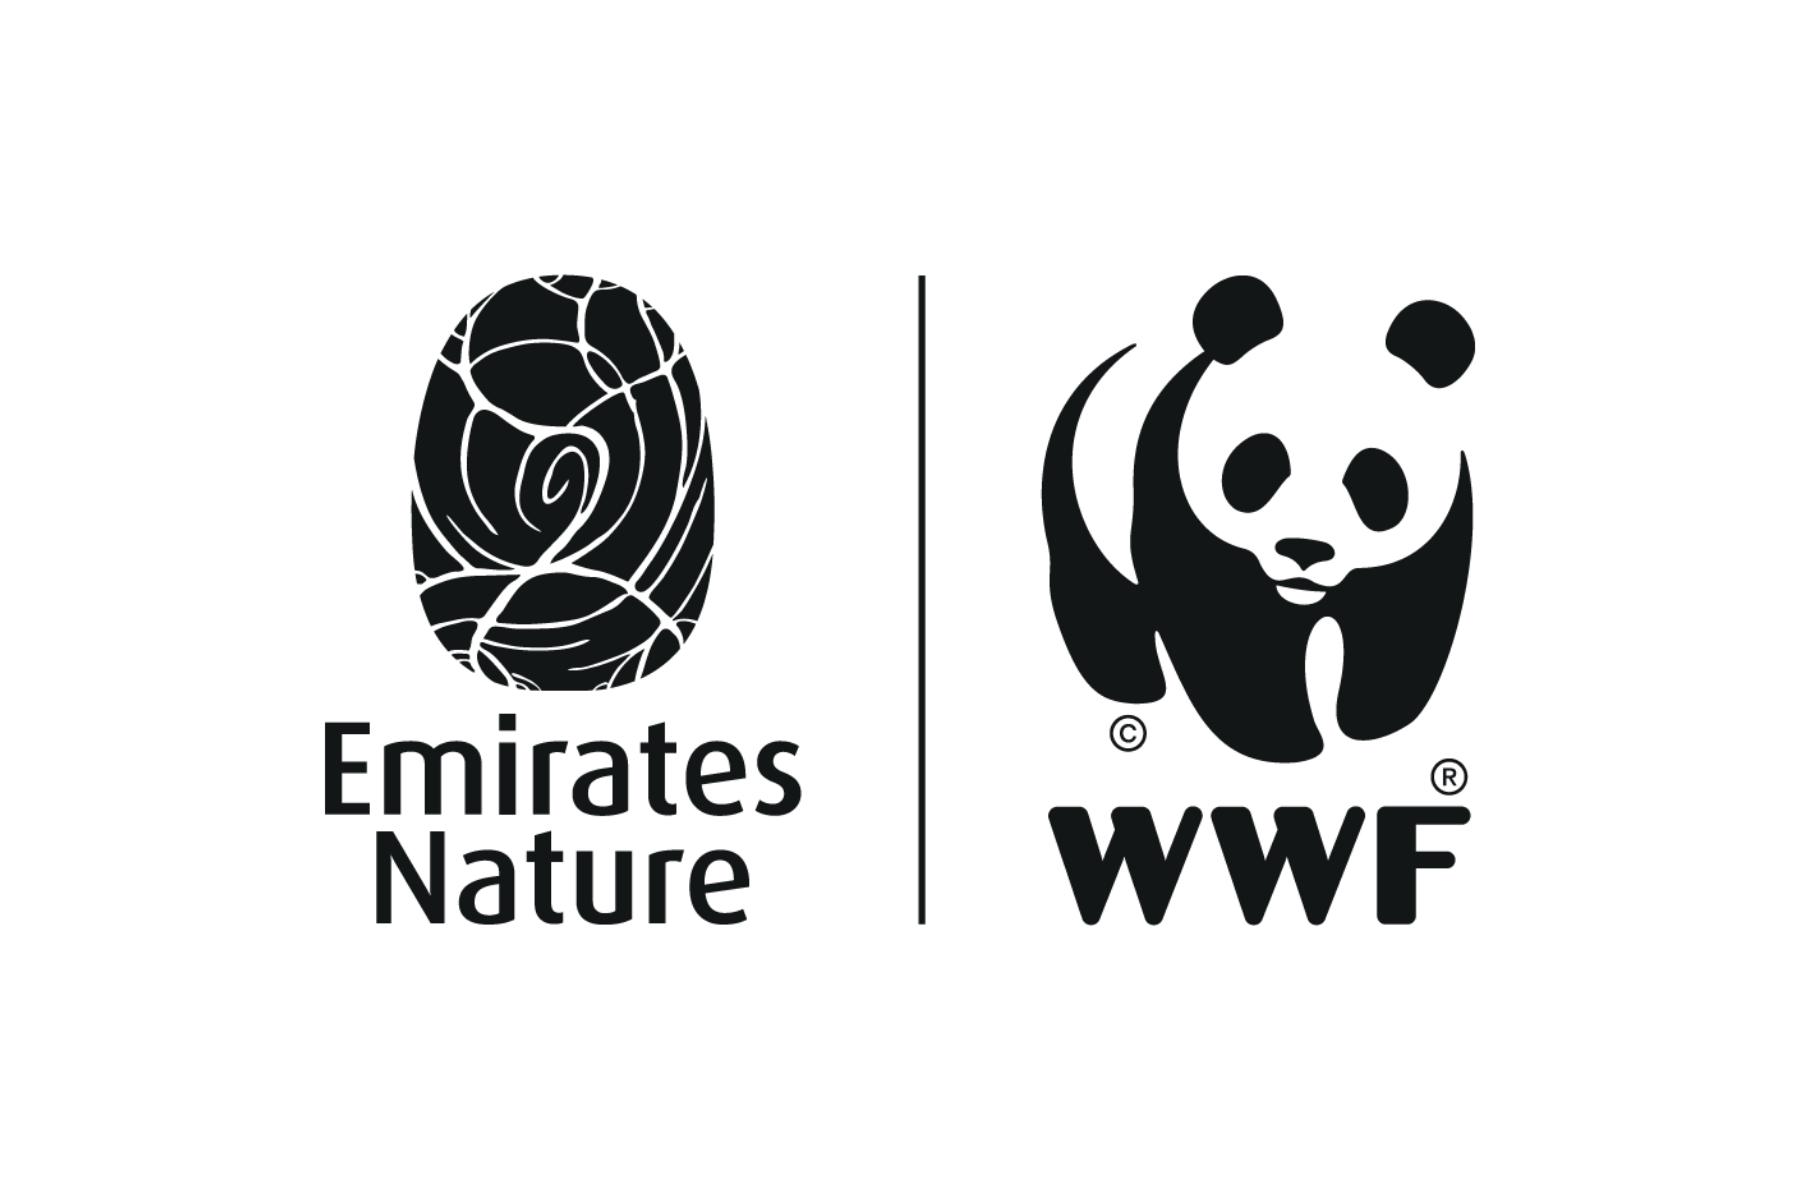 Emirates Nature WWF